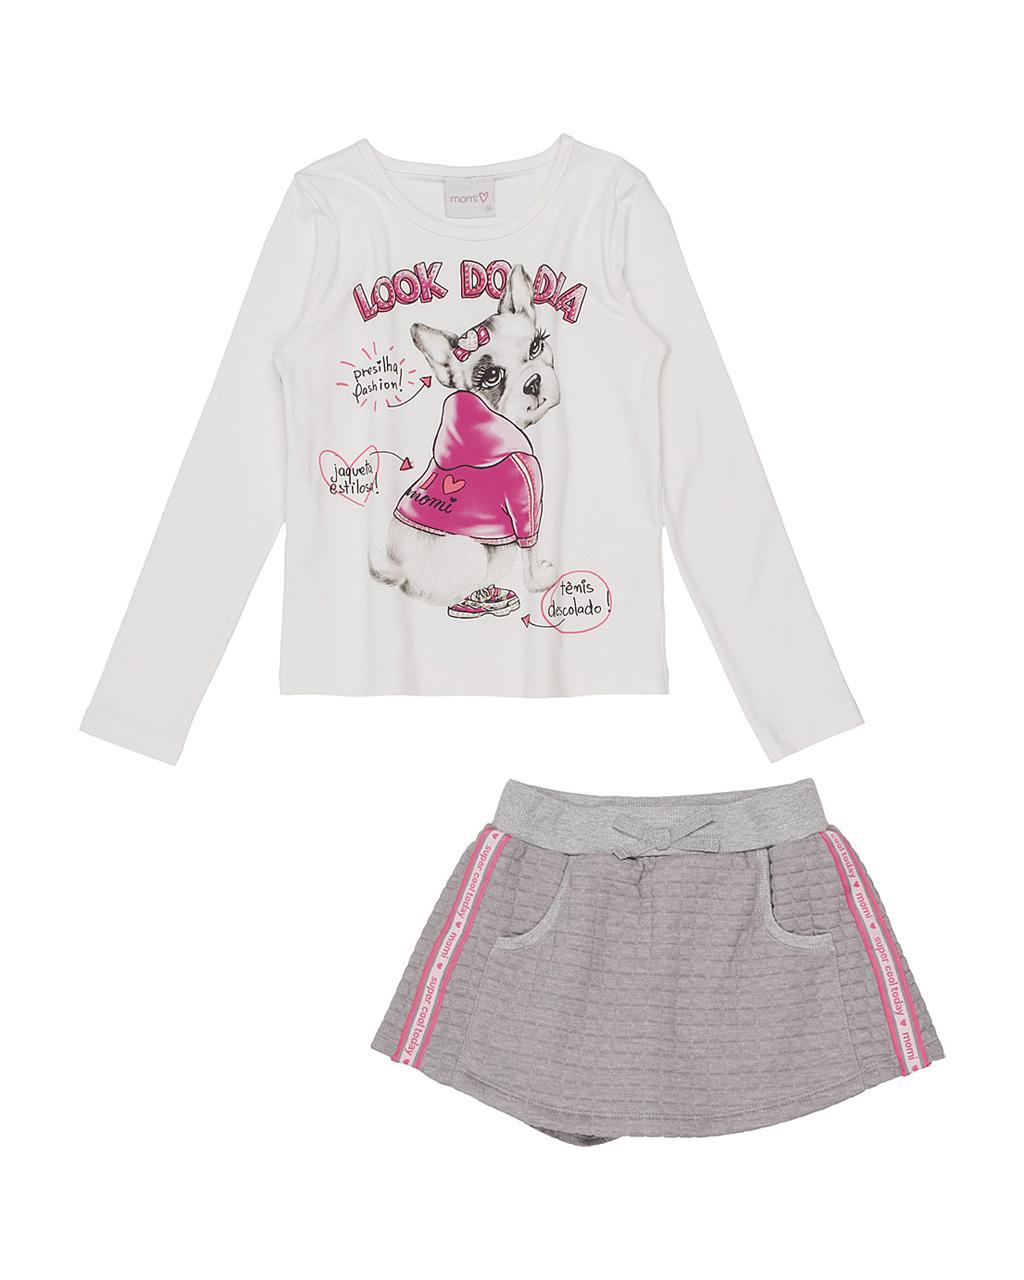 Conjunto Infantil Blusa Look Do Dia E Shorts Saia Jacquard Cinza Com Neon Momi